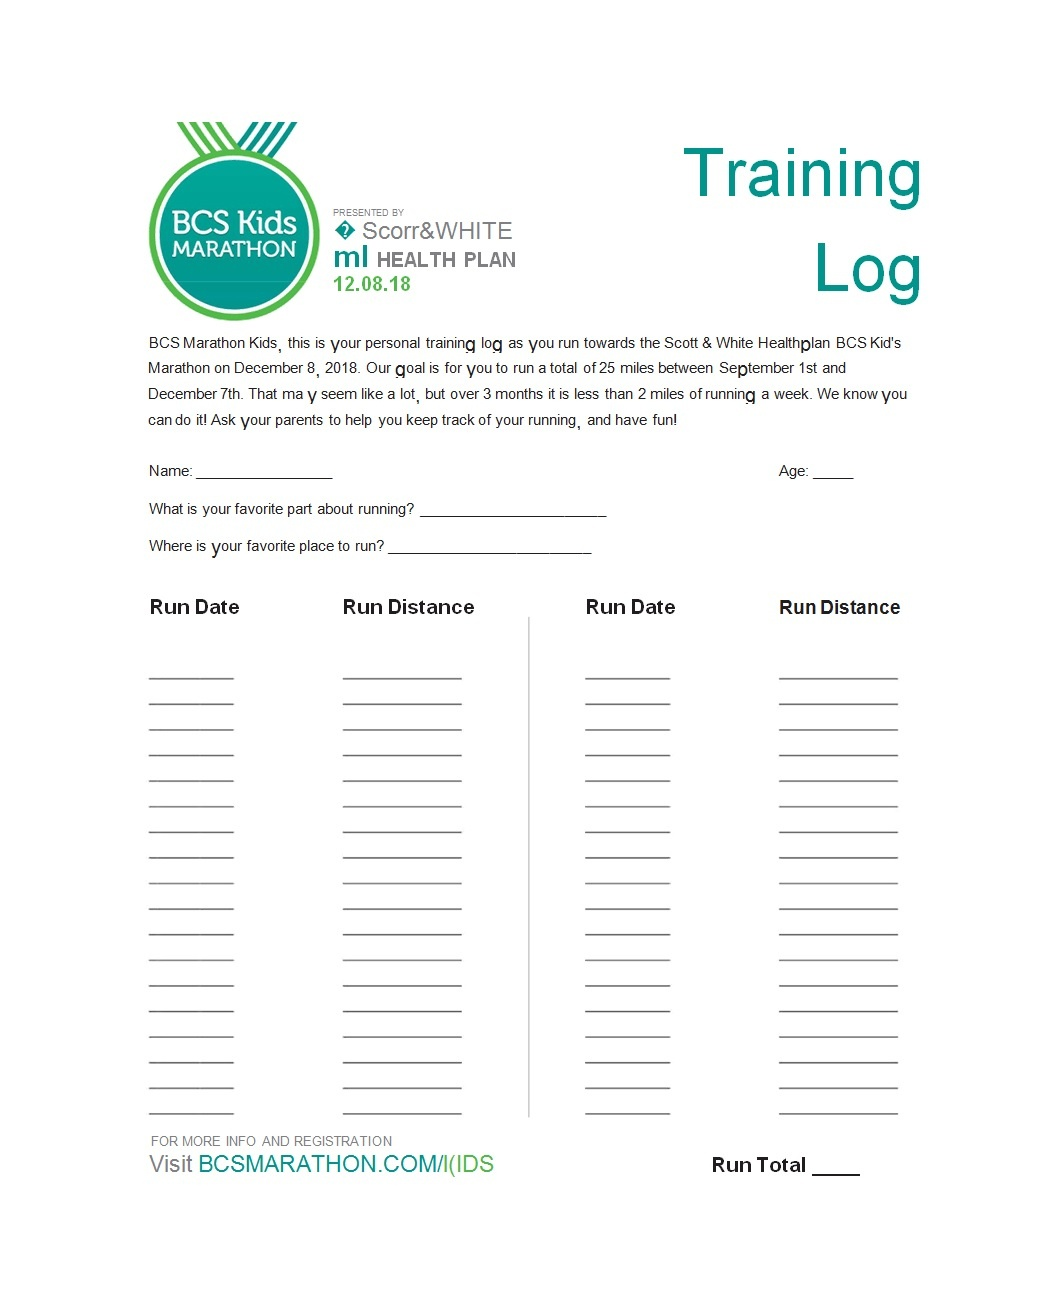 49 Handy Running Log Templates (+Walking Charts) ᐅ Template Lab - Free Printable Running Log